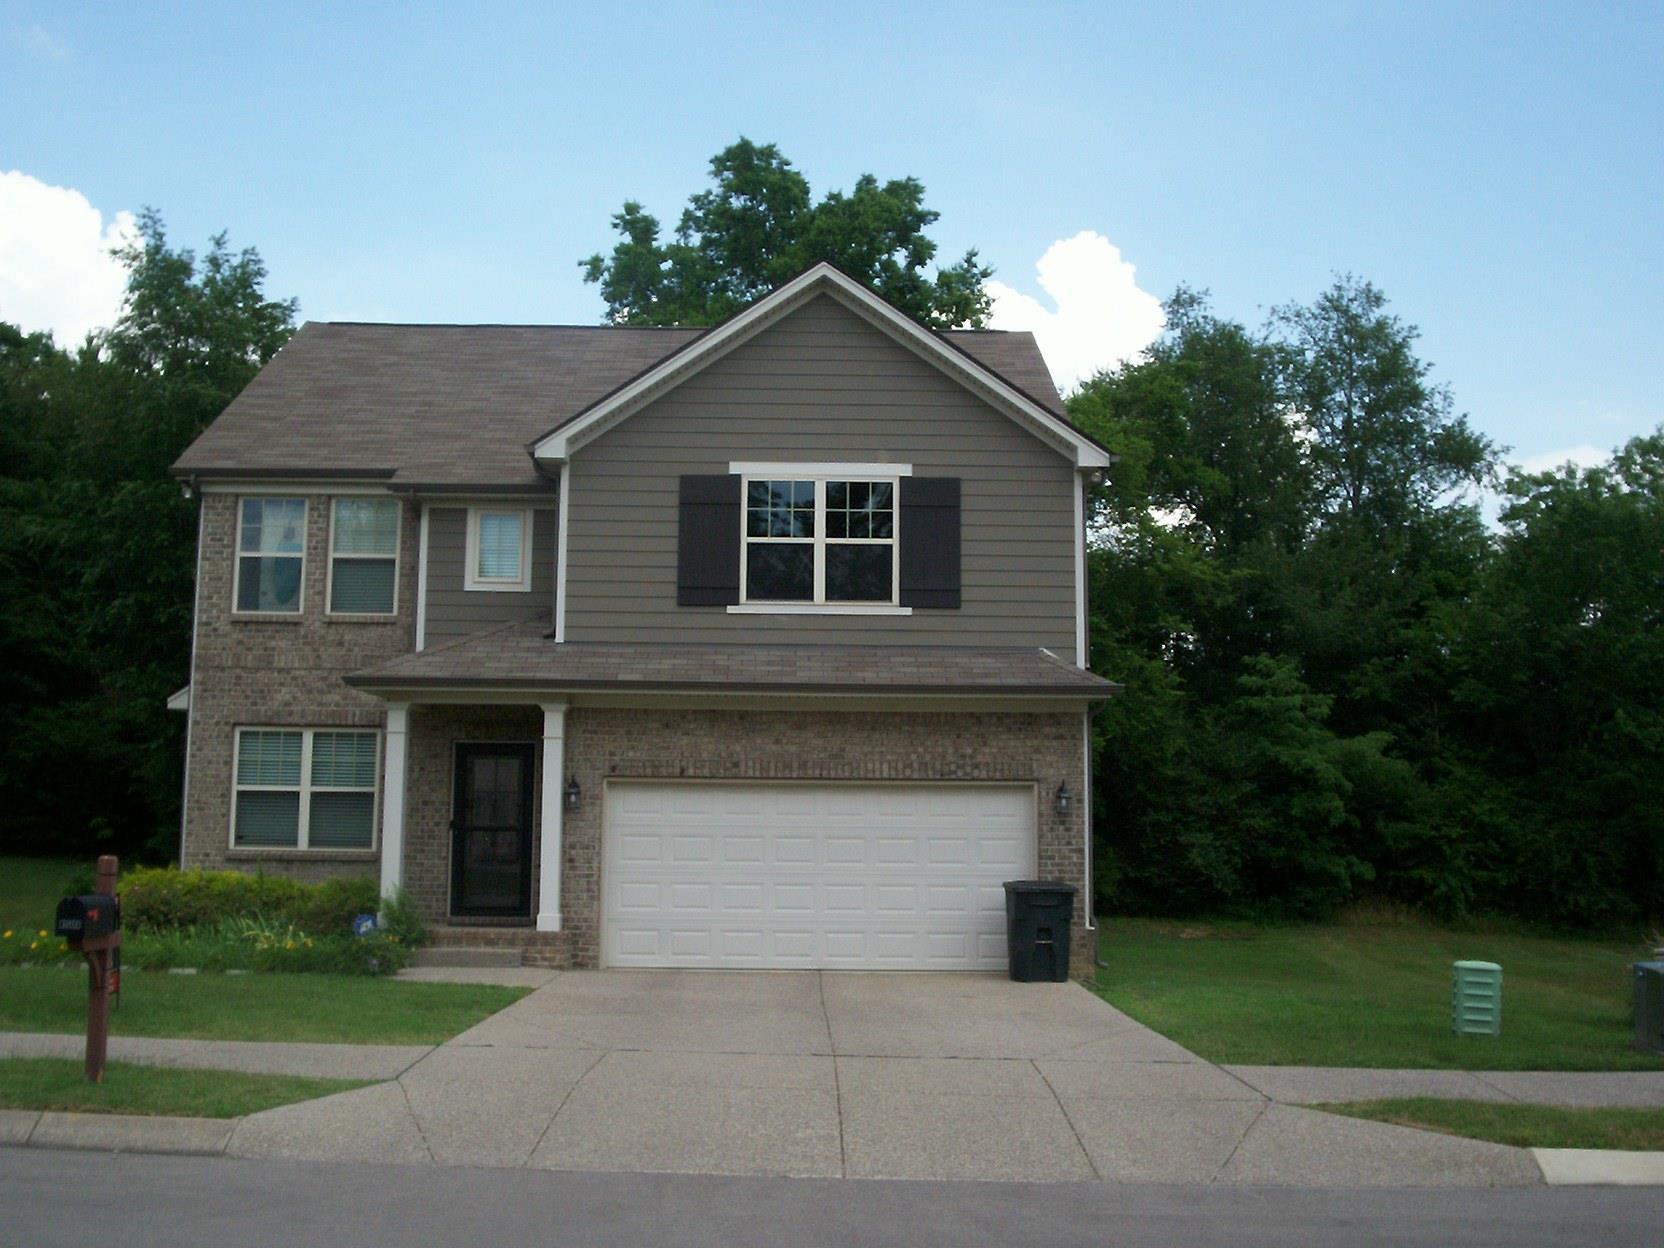 1051 Achiever Cir, Spring Hill, TN 37174 - Spring Hill, TN real estate listing